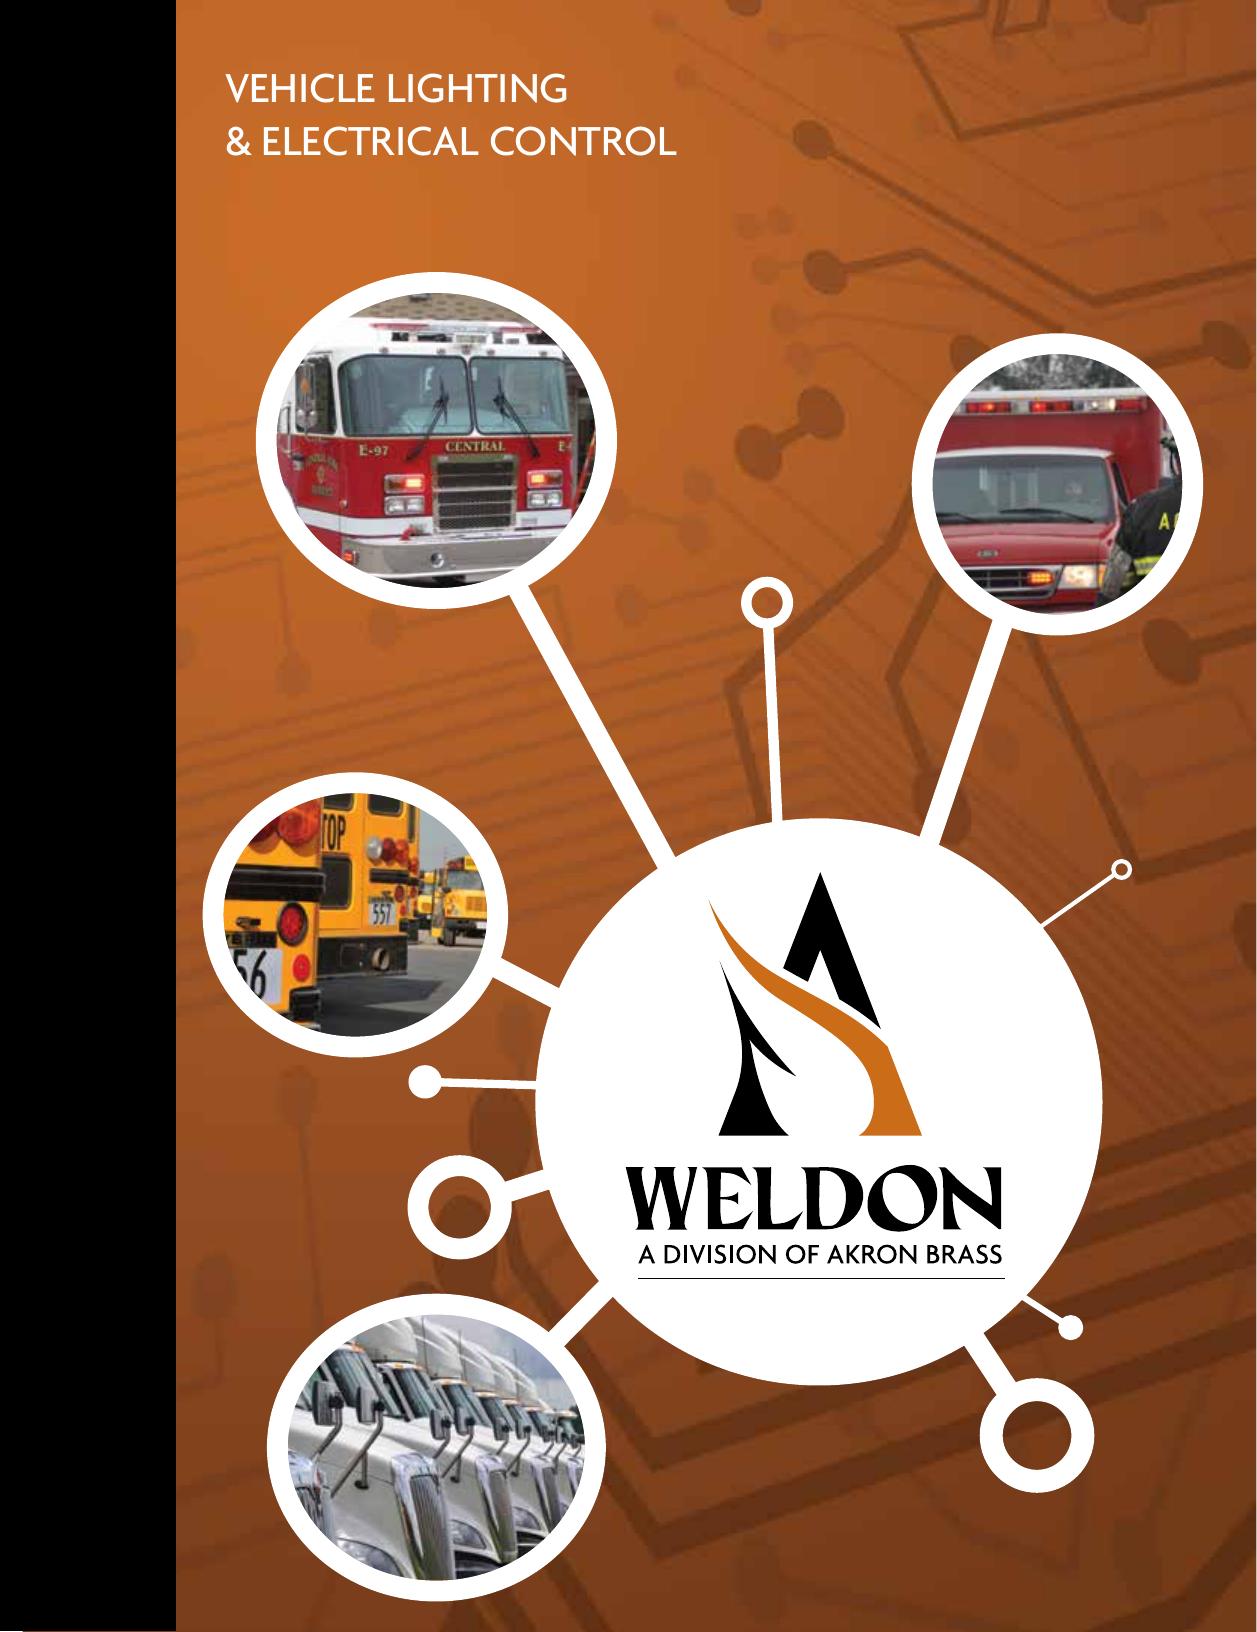 2014 Weldon Catalog on